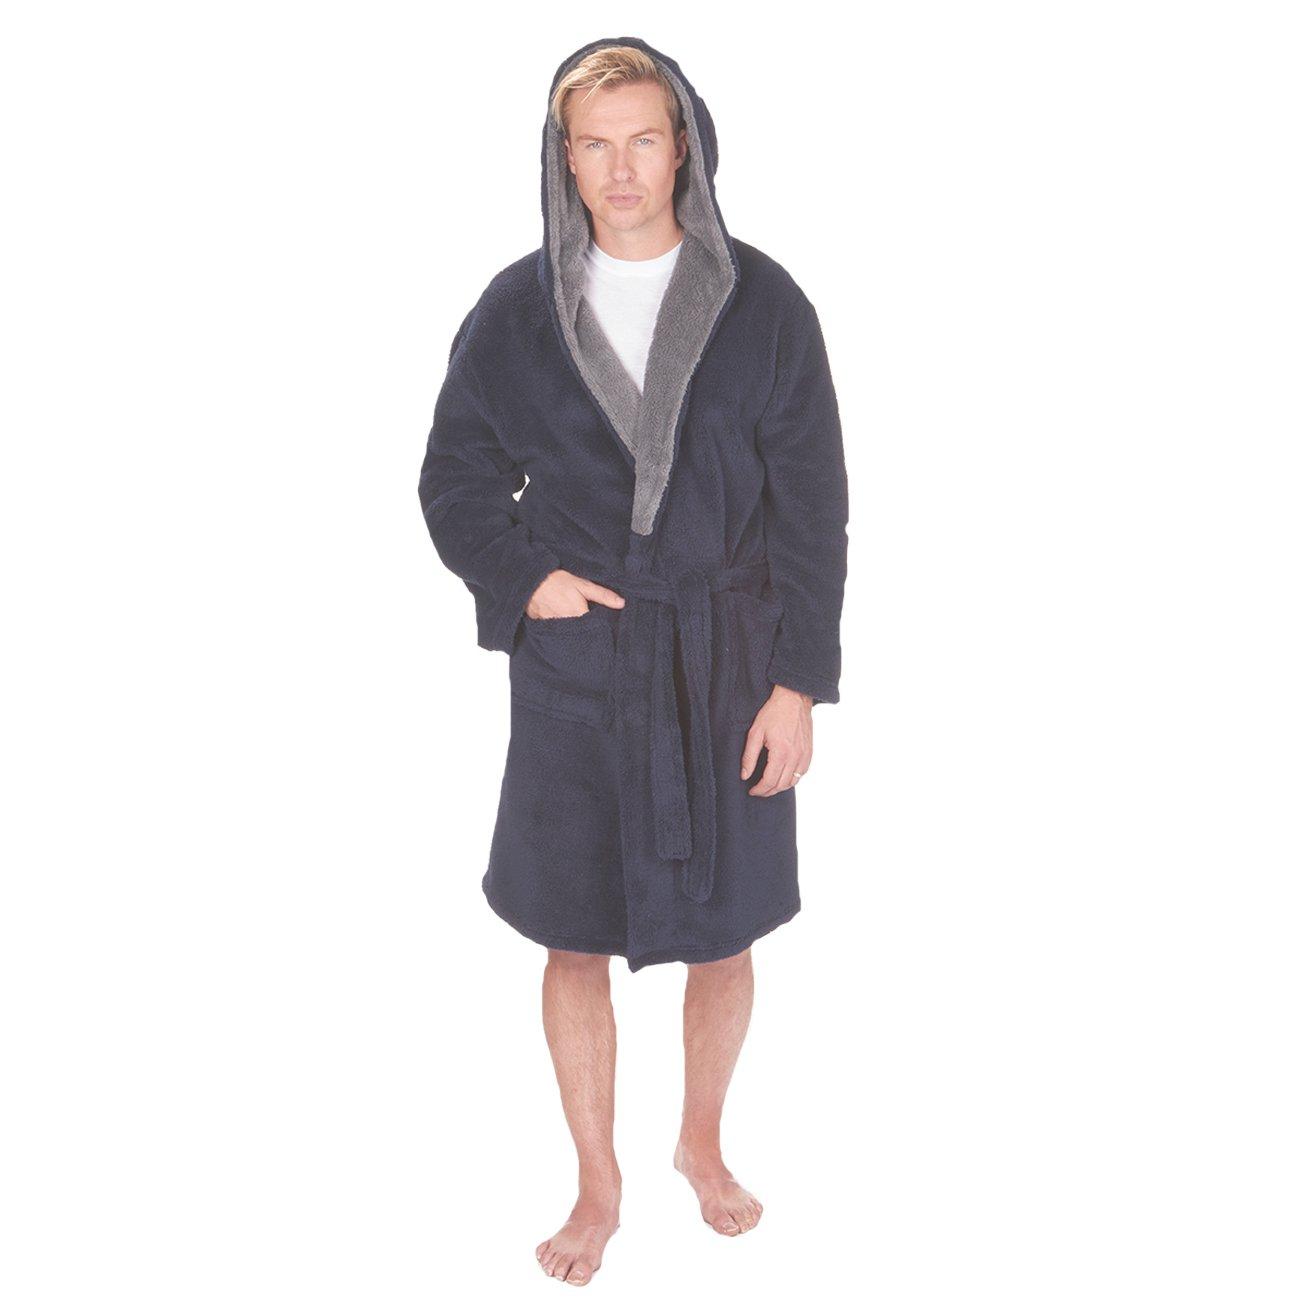 Pierre Roche Mens King Big Size Dressing Gown Robe Luxury Snuggle Fleece Plus Sized 3XL-5XL